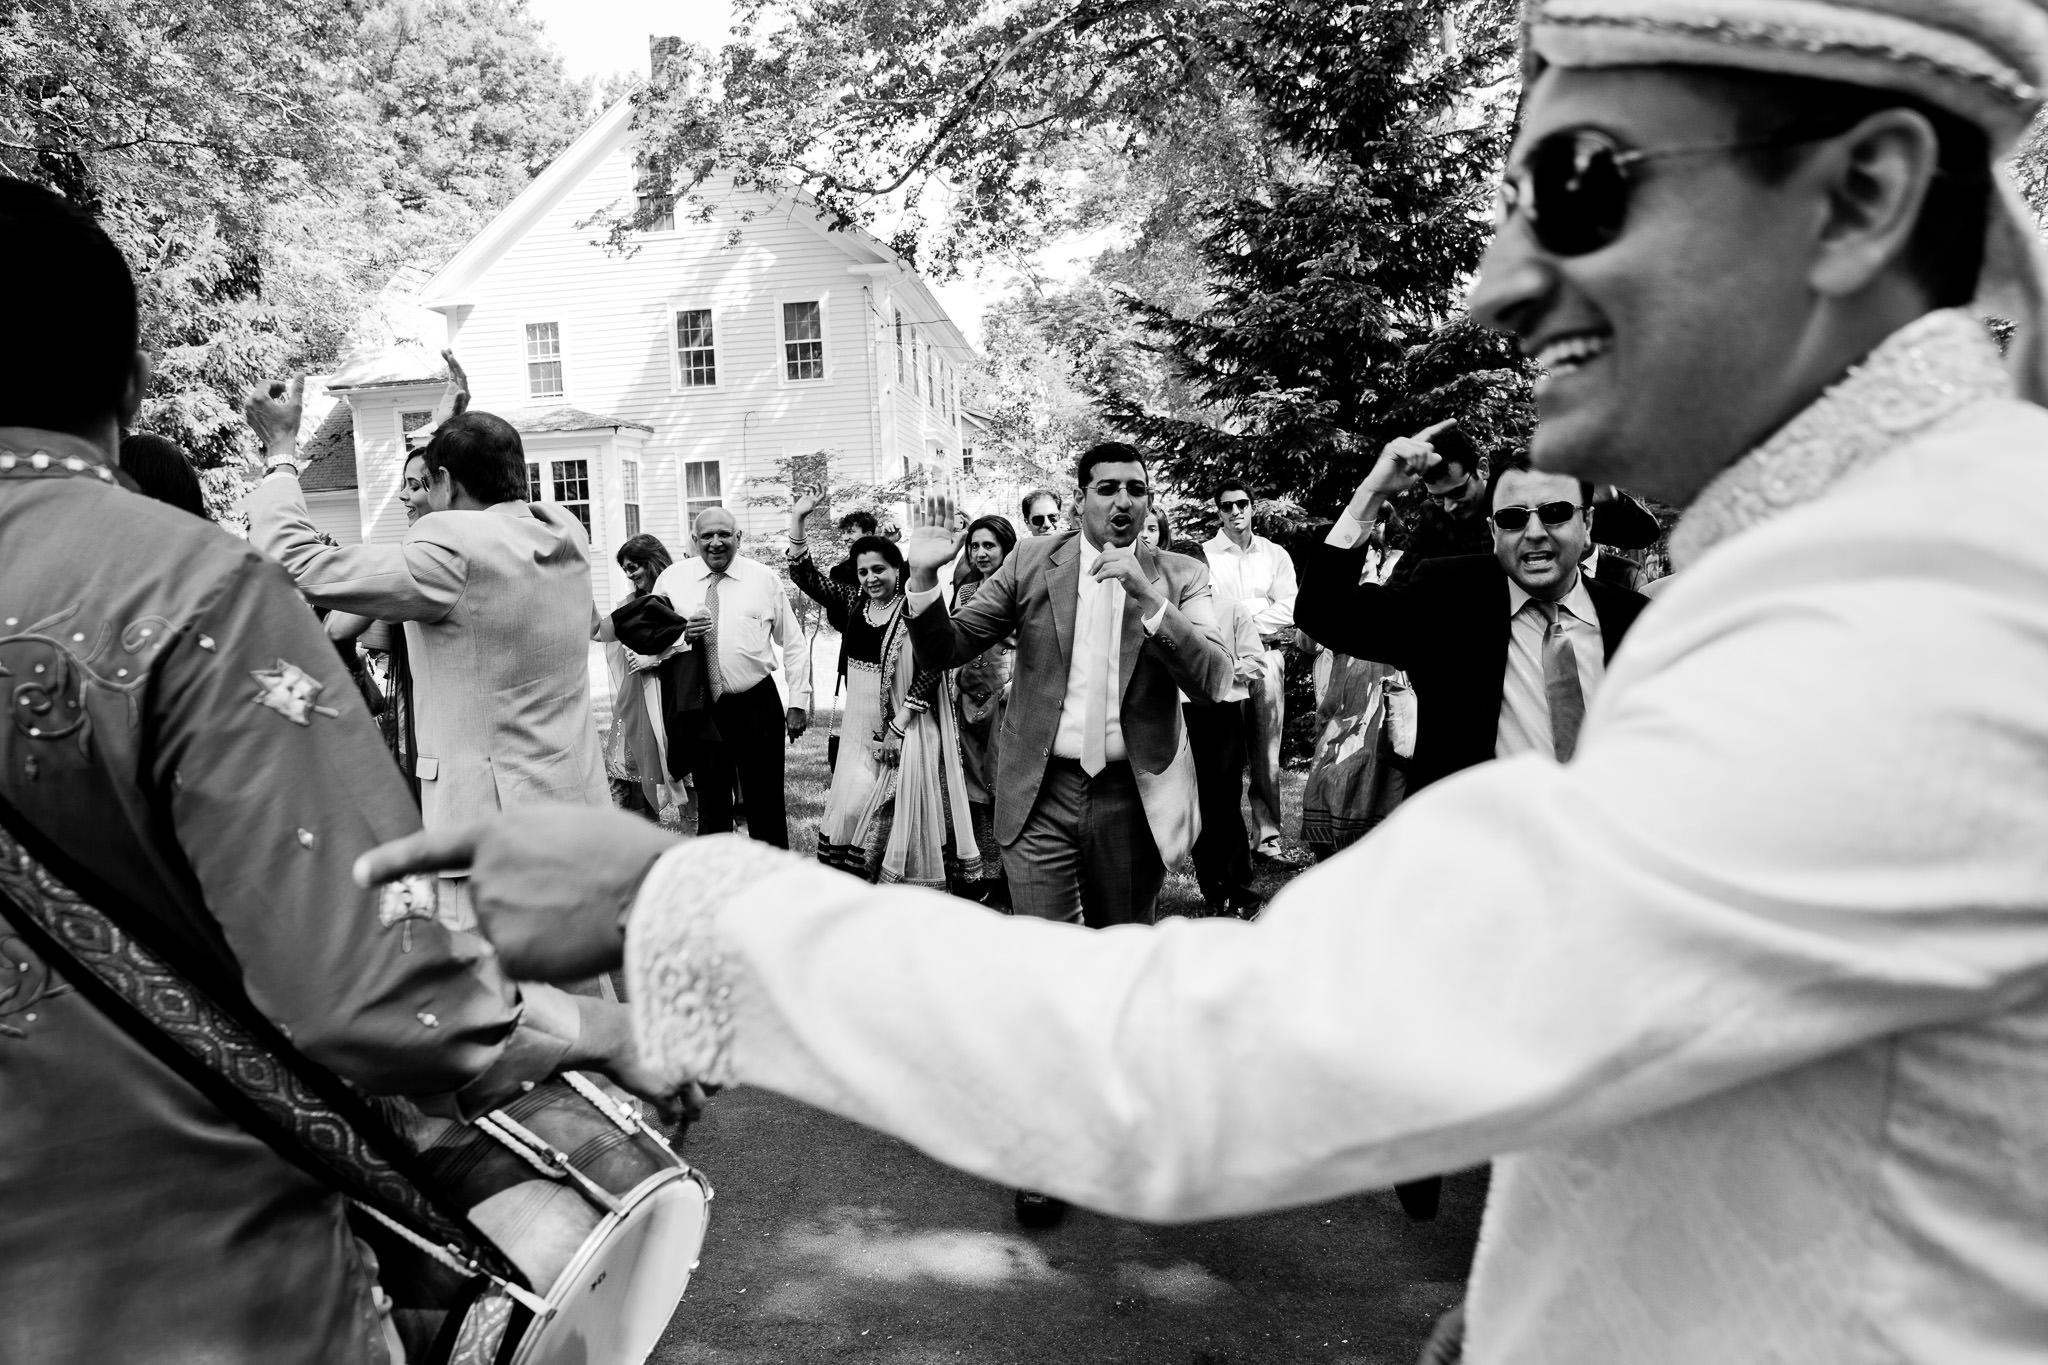 026_Canada-documentary-wedding-photograp